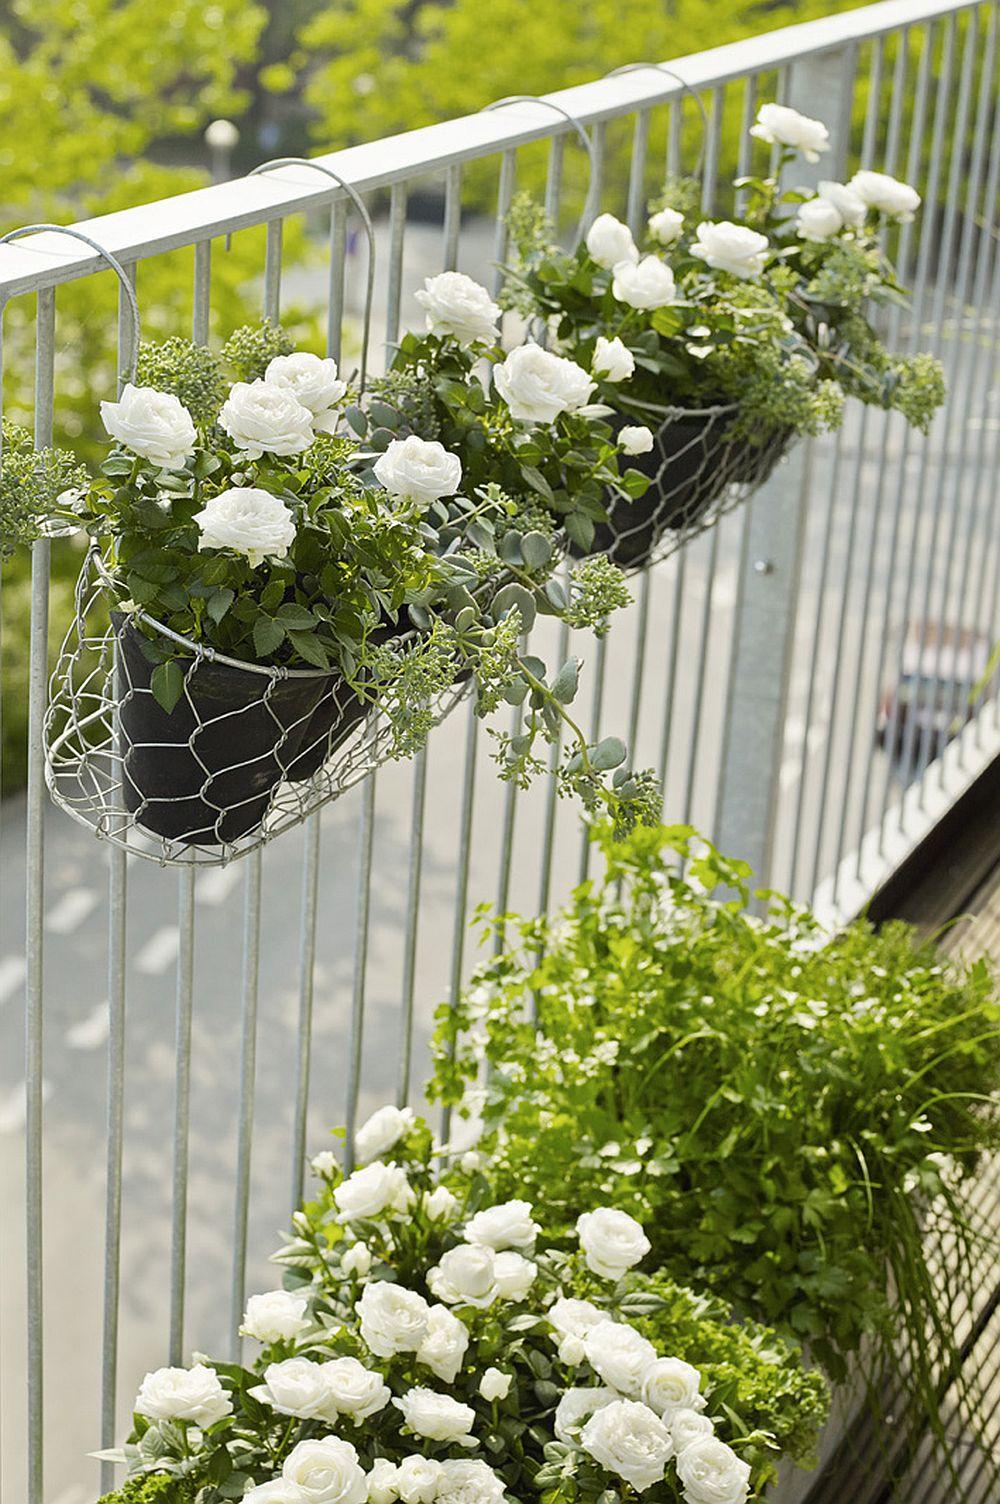 adelaparvu.com despre trandafirii pitici, ingrijirea trandafirilor pitici, Rosa hybrid, text Carli Marian, Foto Floradania (16)